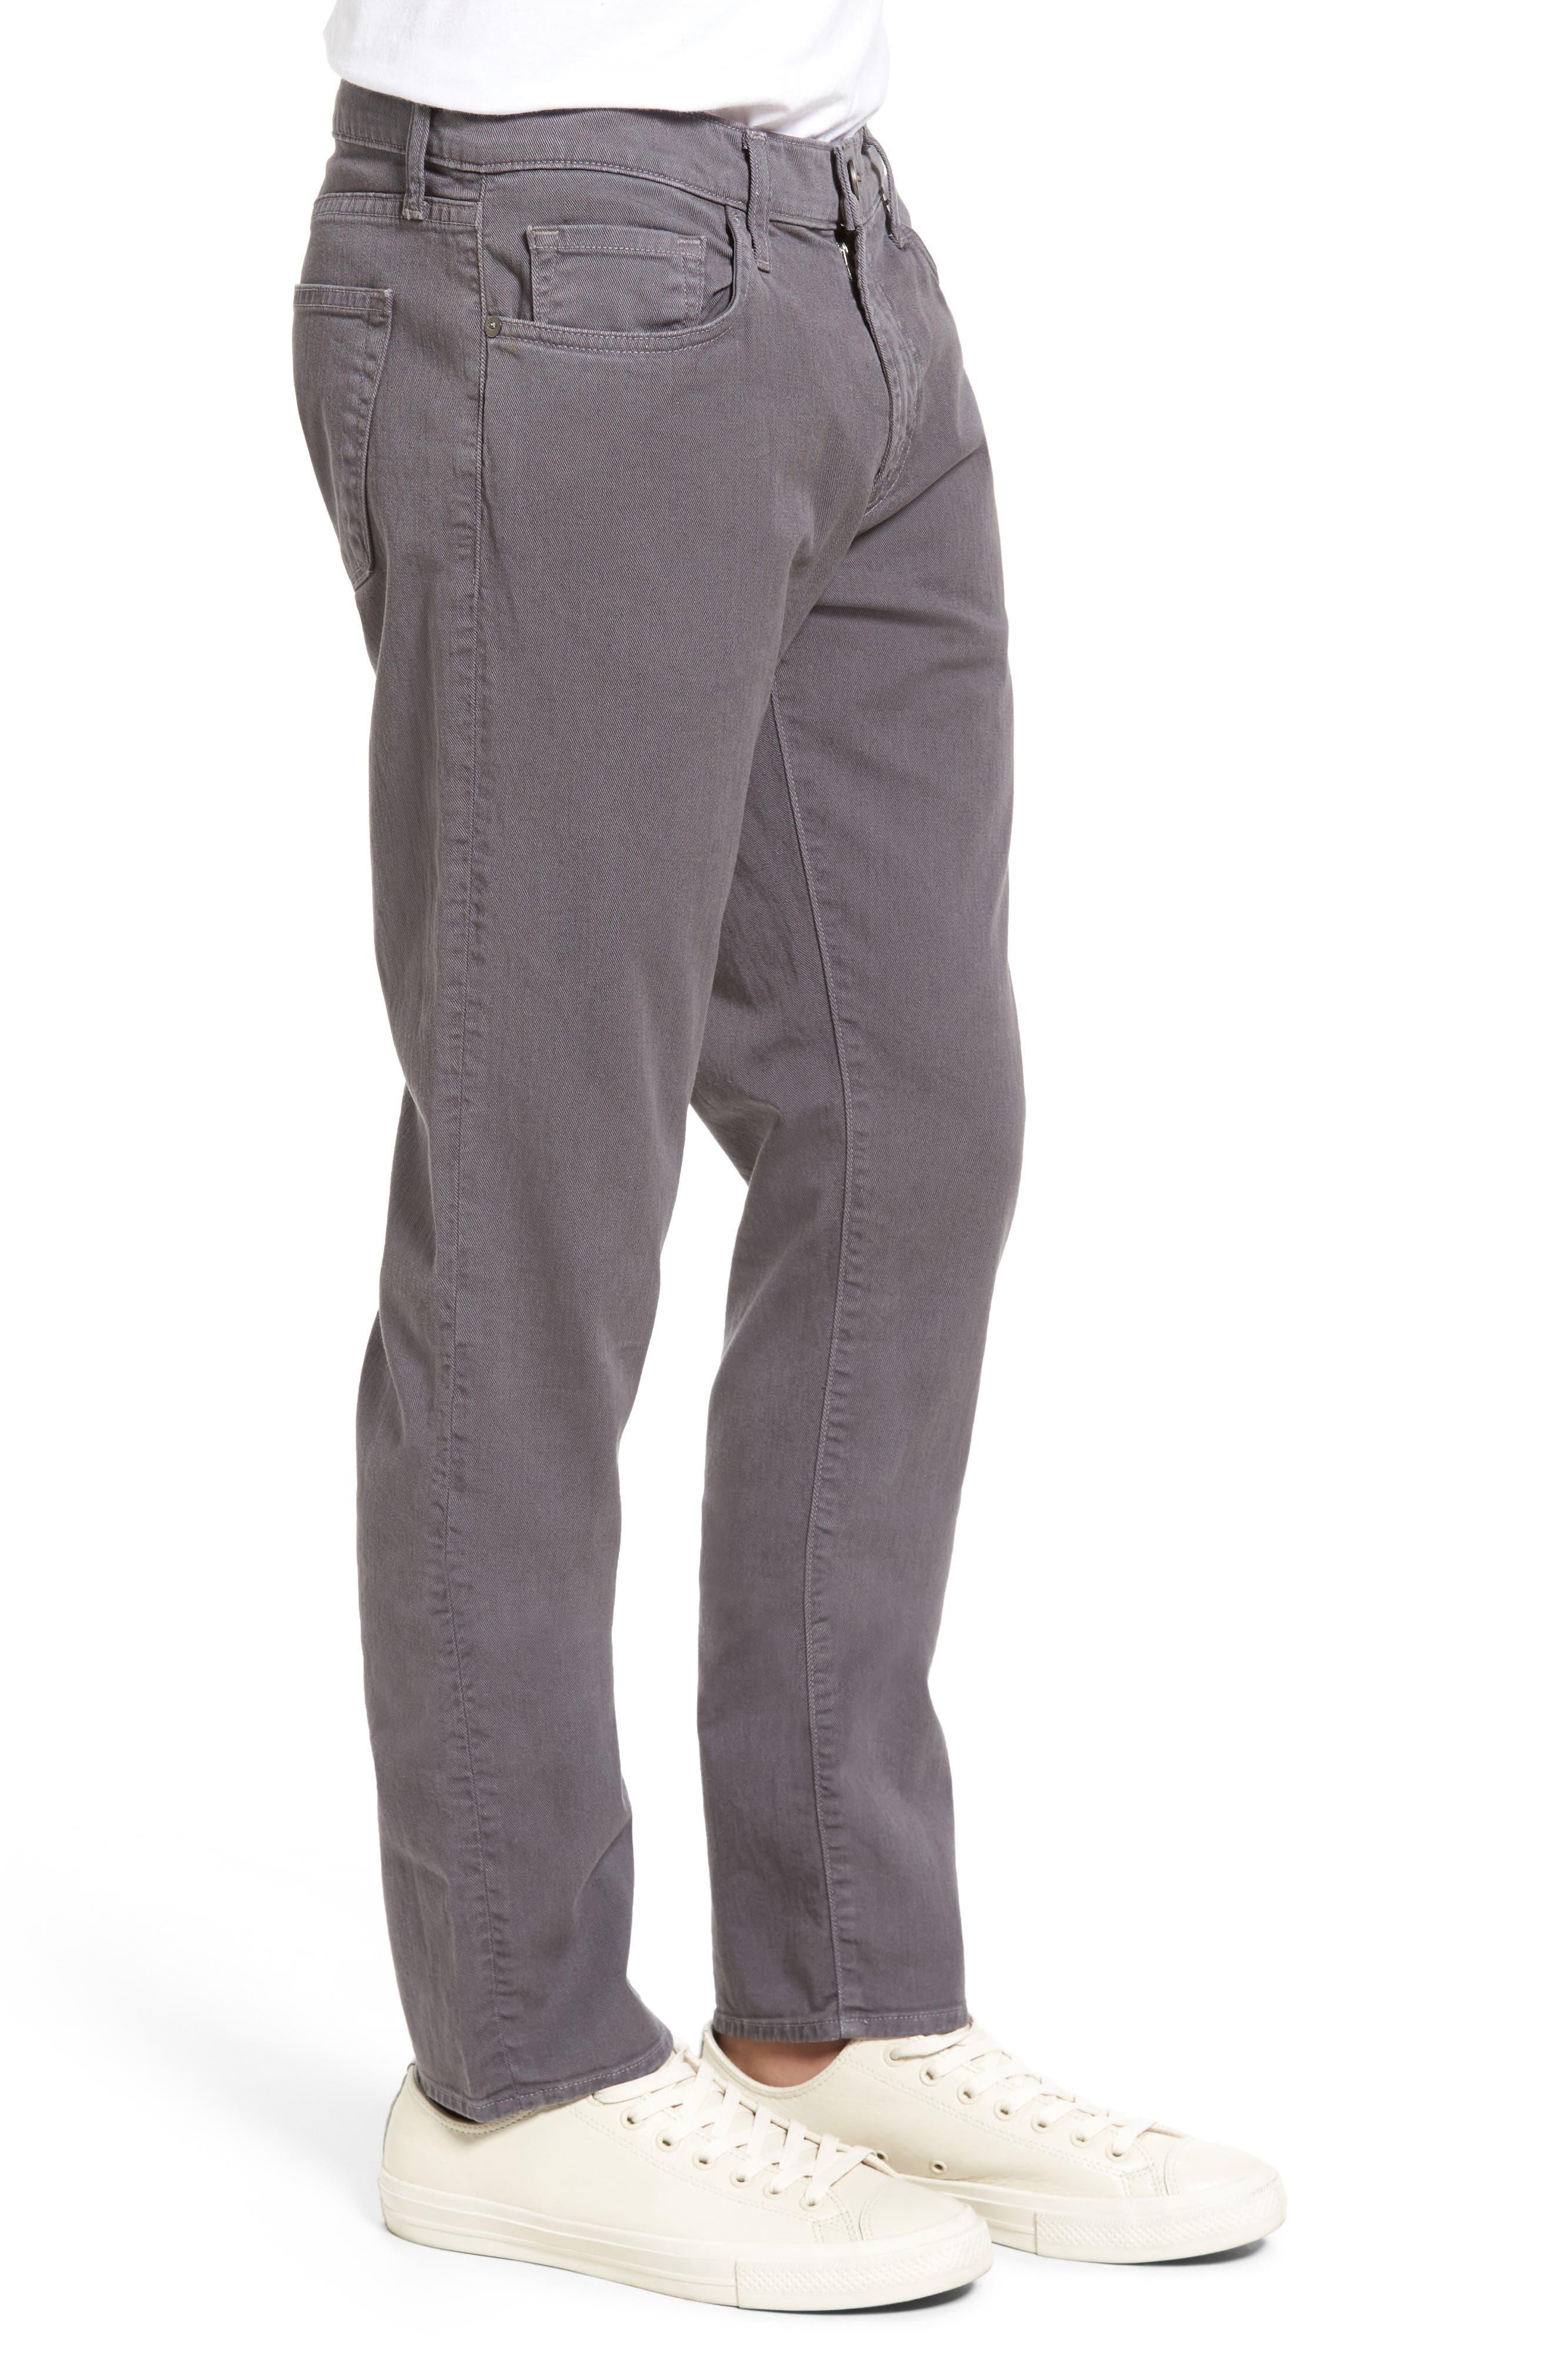 Tyler Slim Fit Jeans,                             Alternate thumbnail 3, color,                             Iron Gate